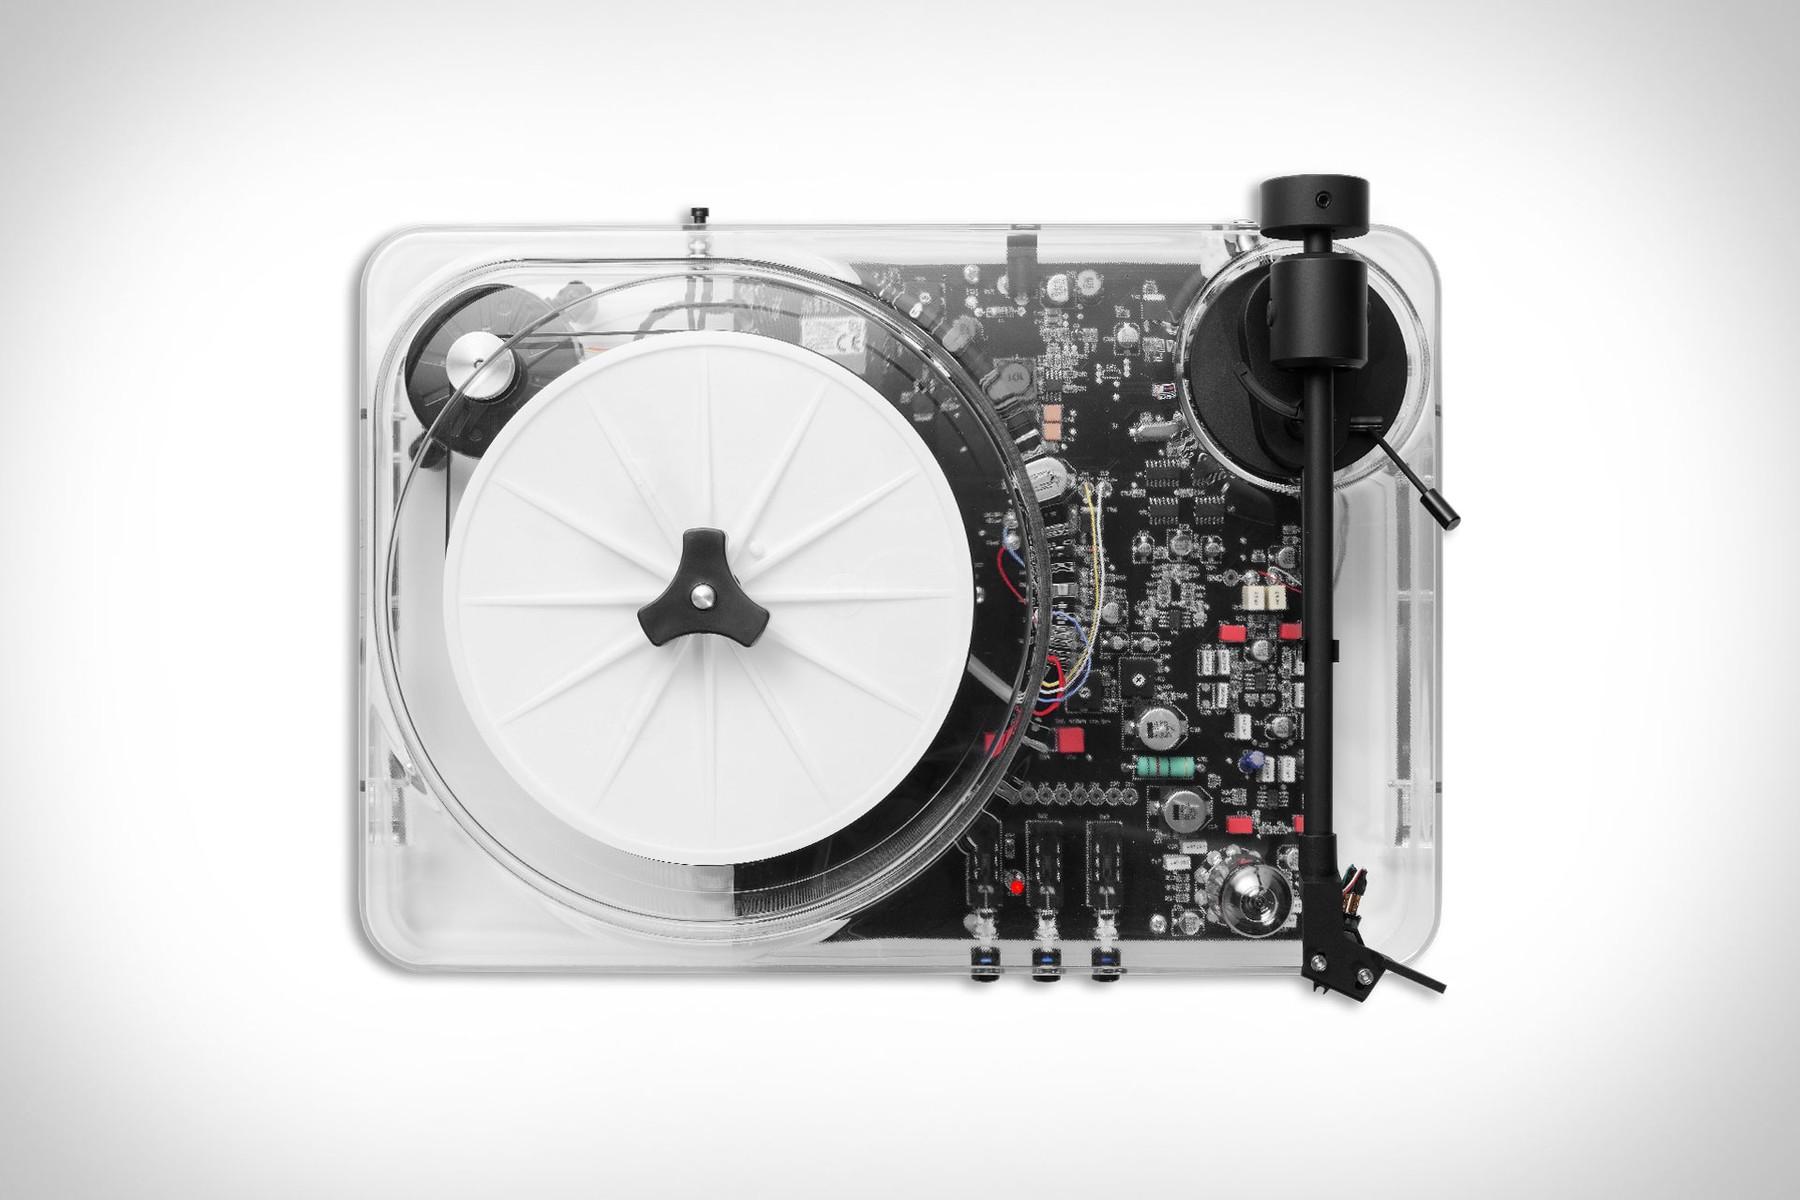 gear-box-turntable-1.jpg